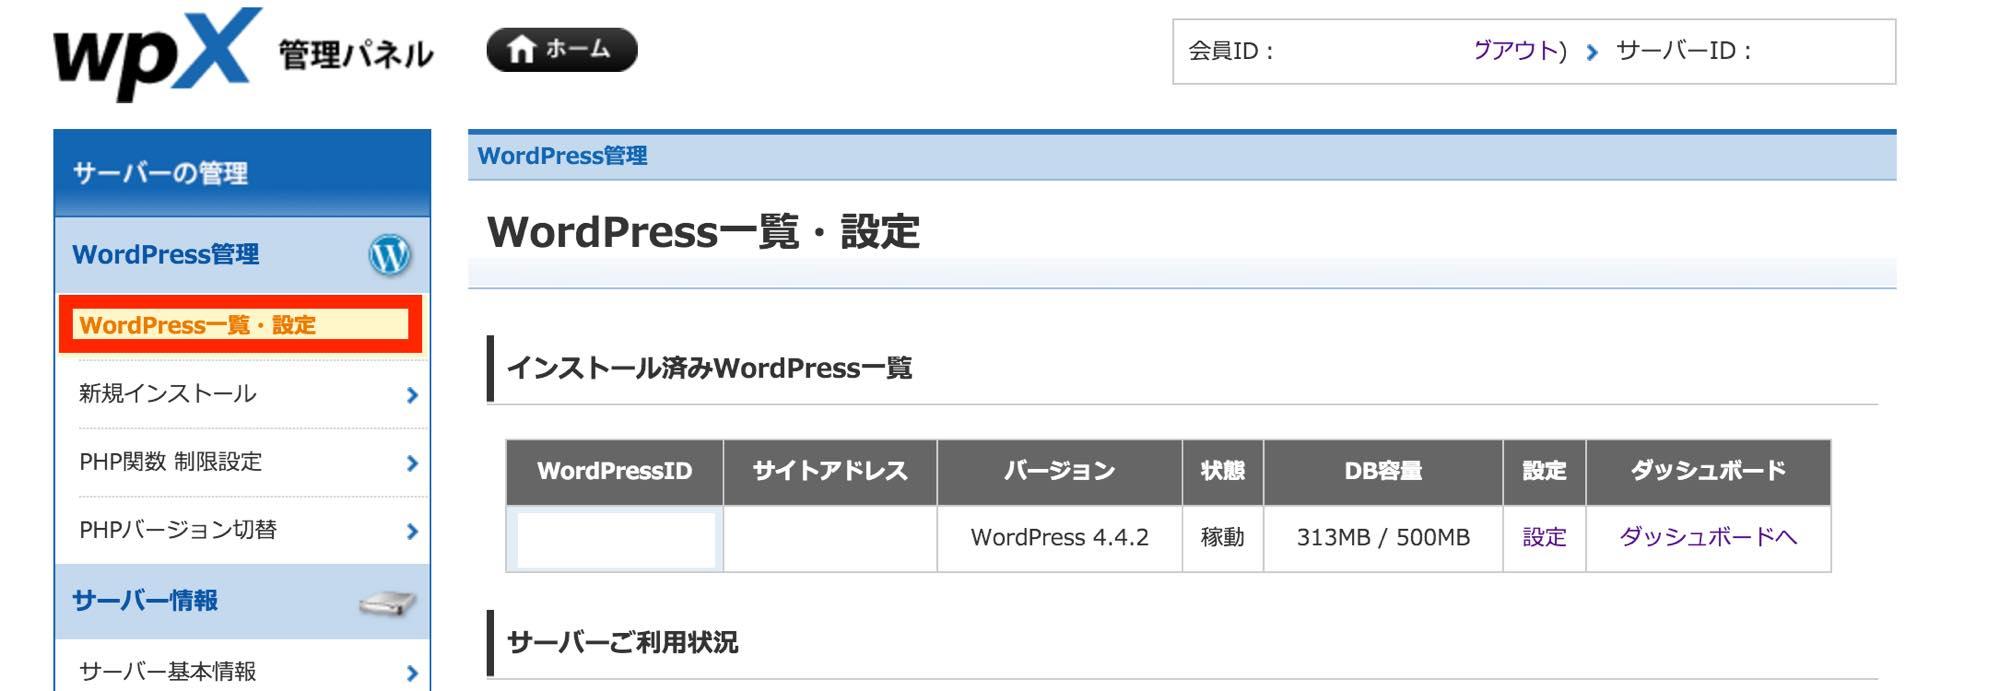 wpx-push7-error6